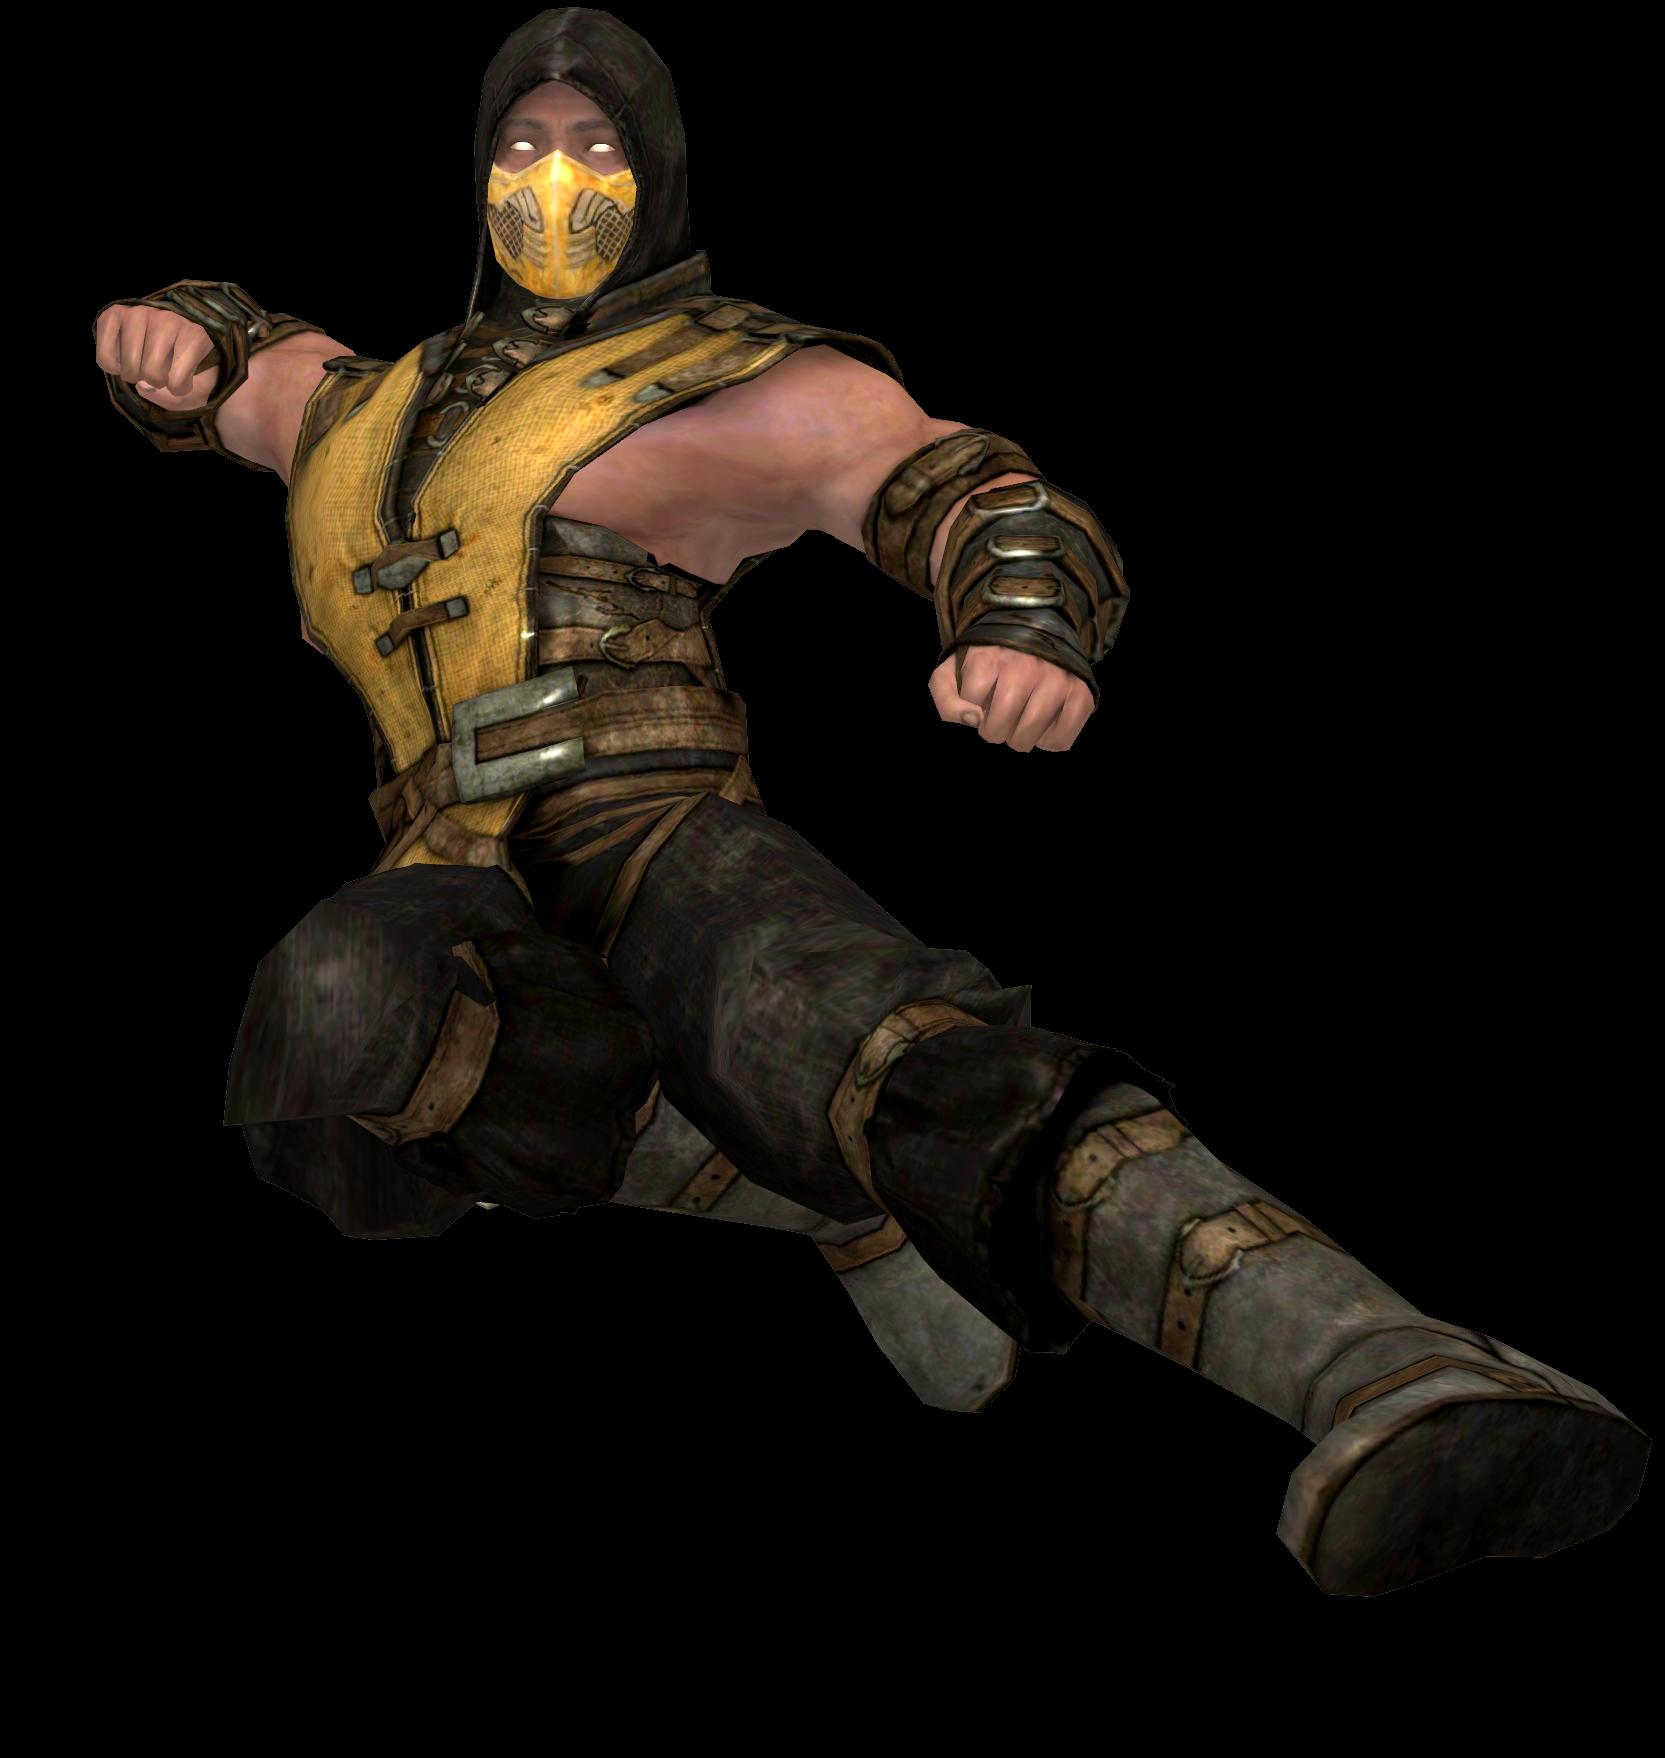 Mortal Kombat HD PNG